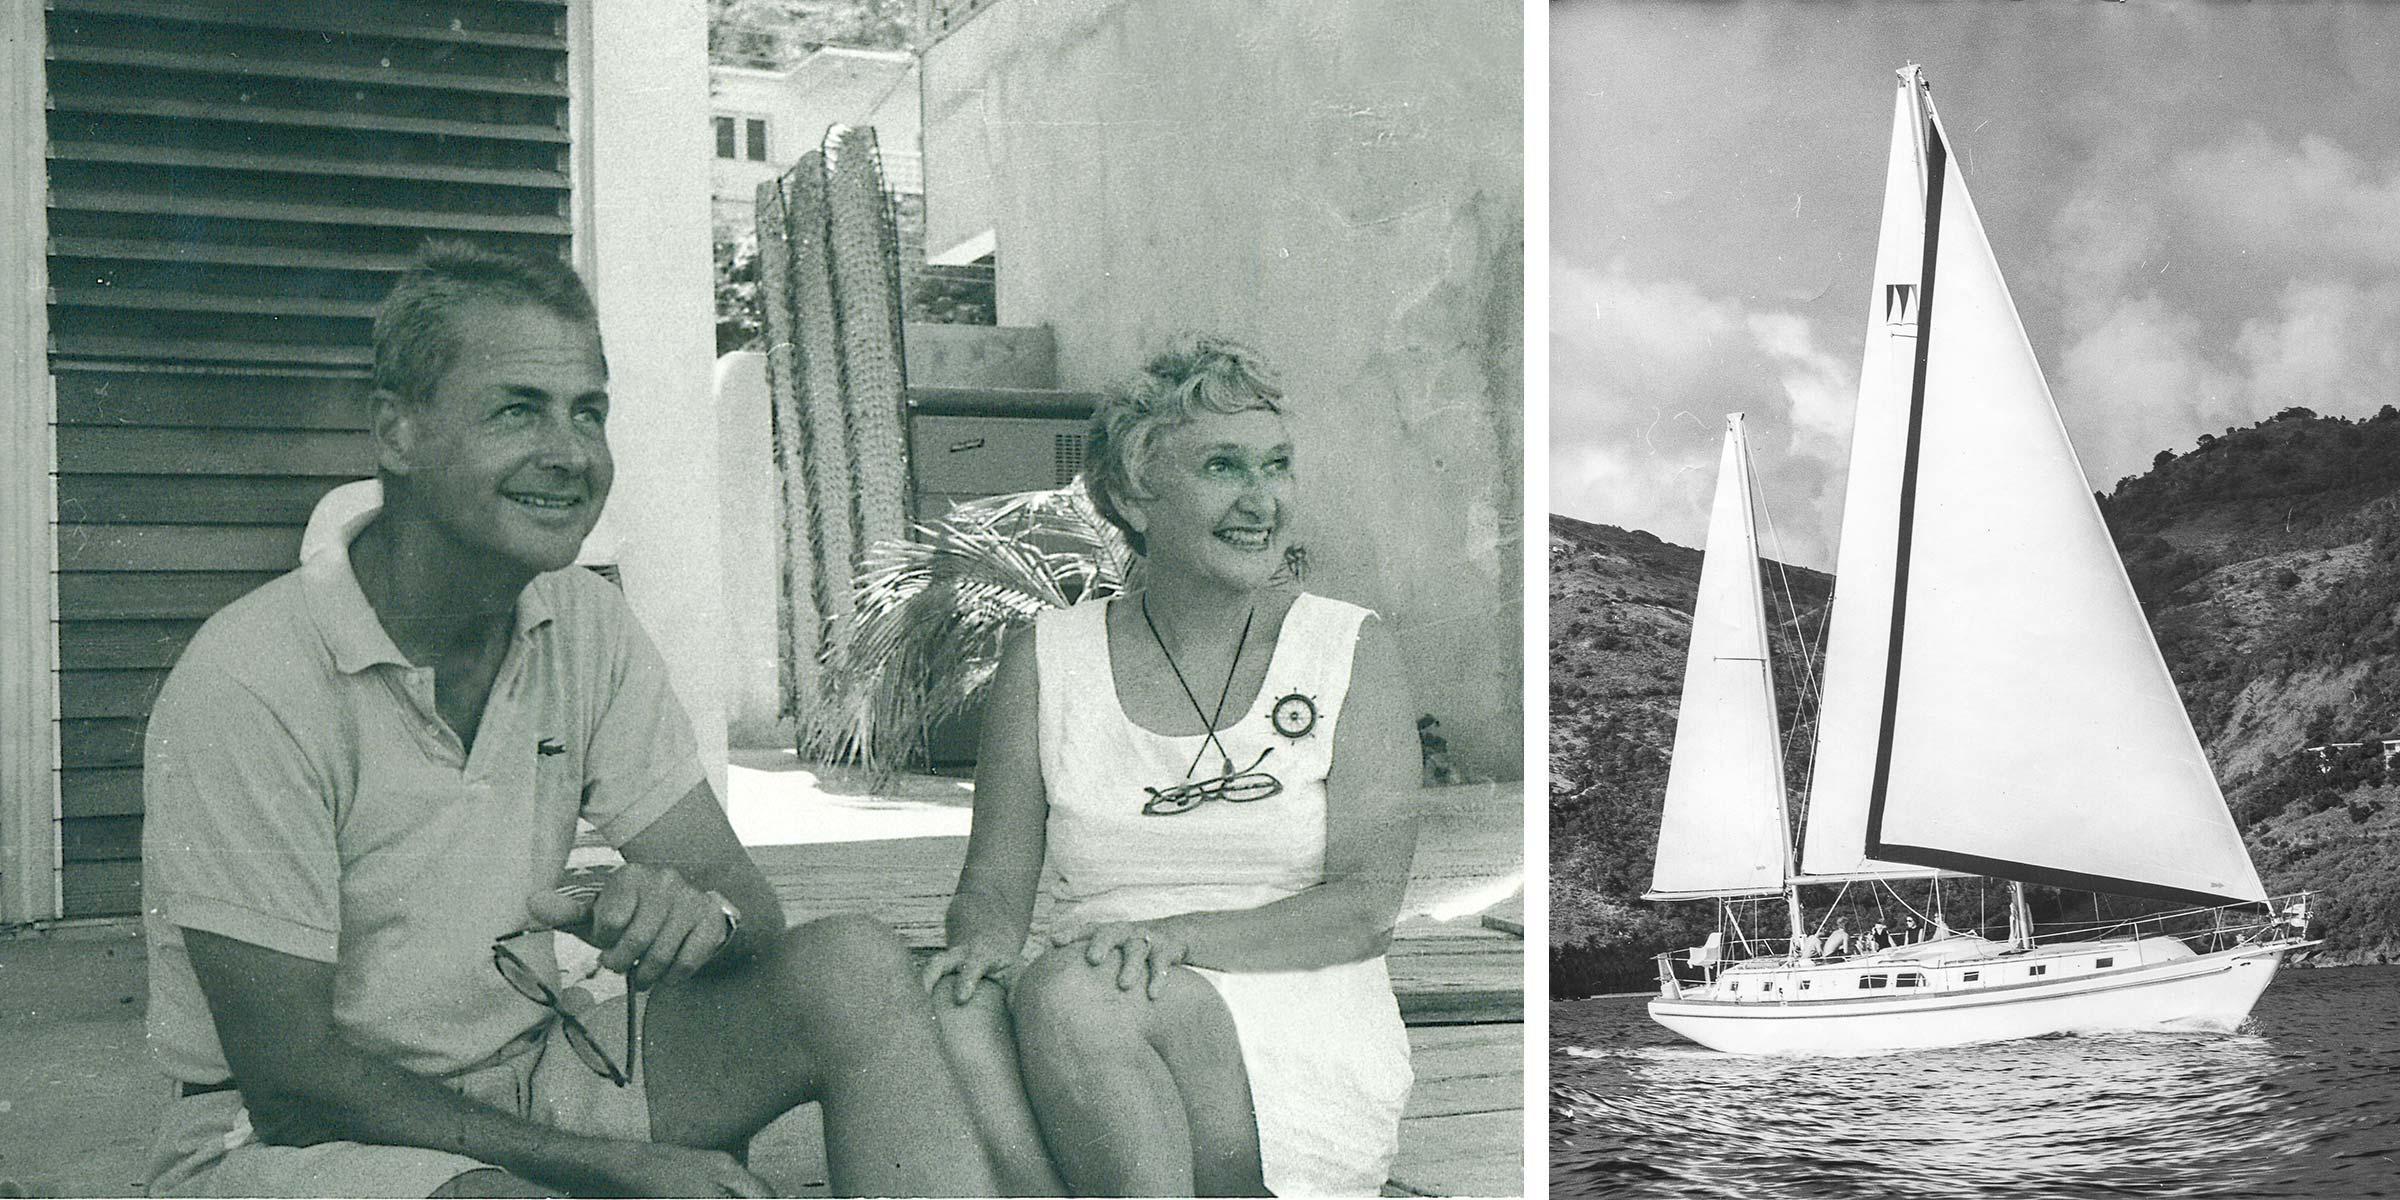 charlie_ginnie_cary_sailing_yacht_2400x1200_web